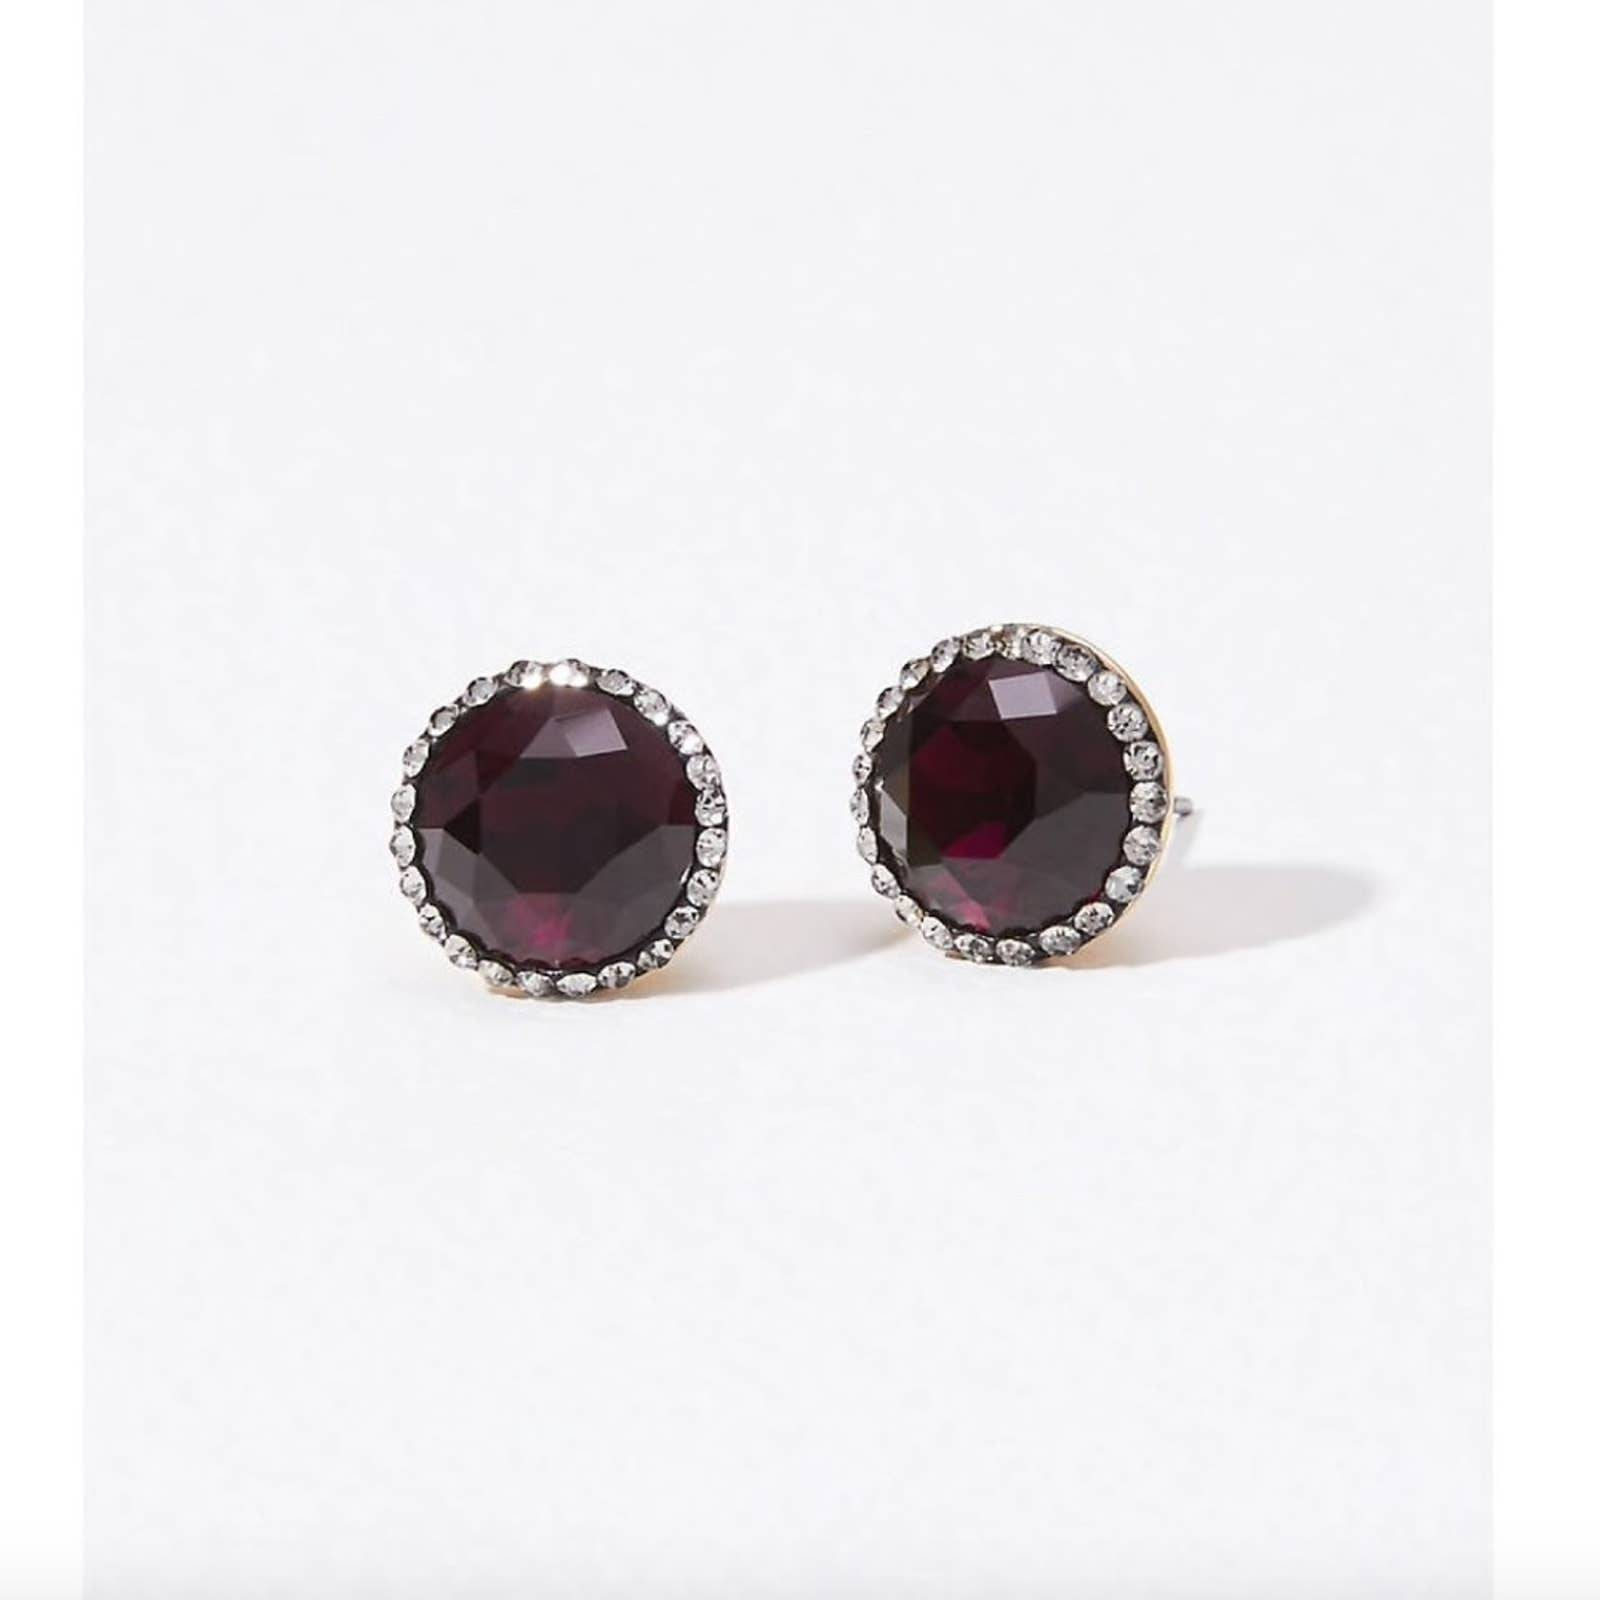 NWT LOFT Ruby Red Stone Stud Earrings